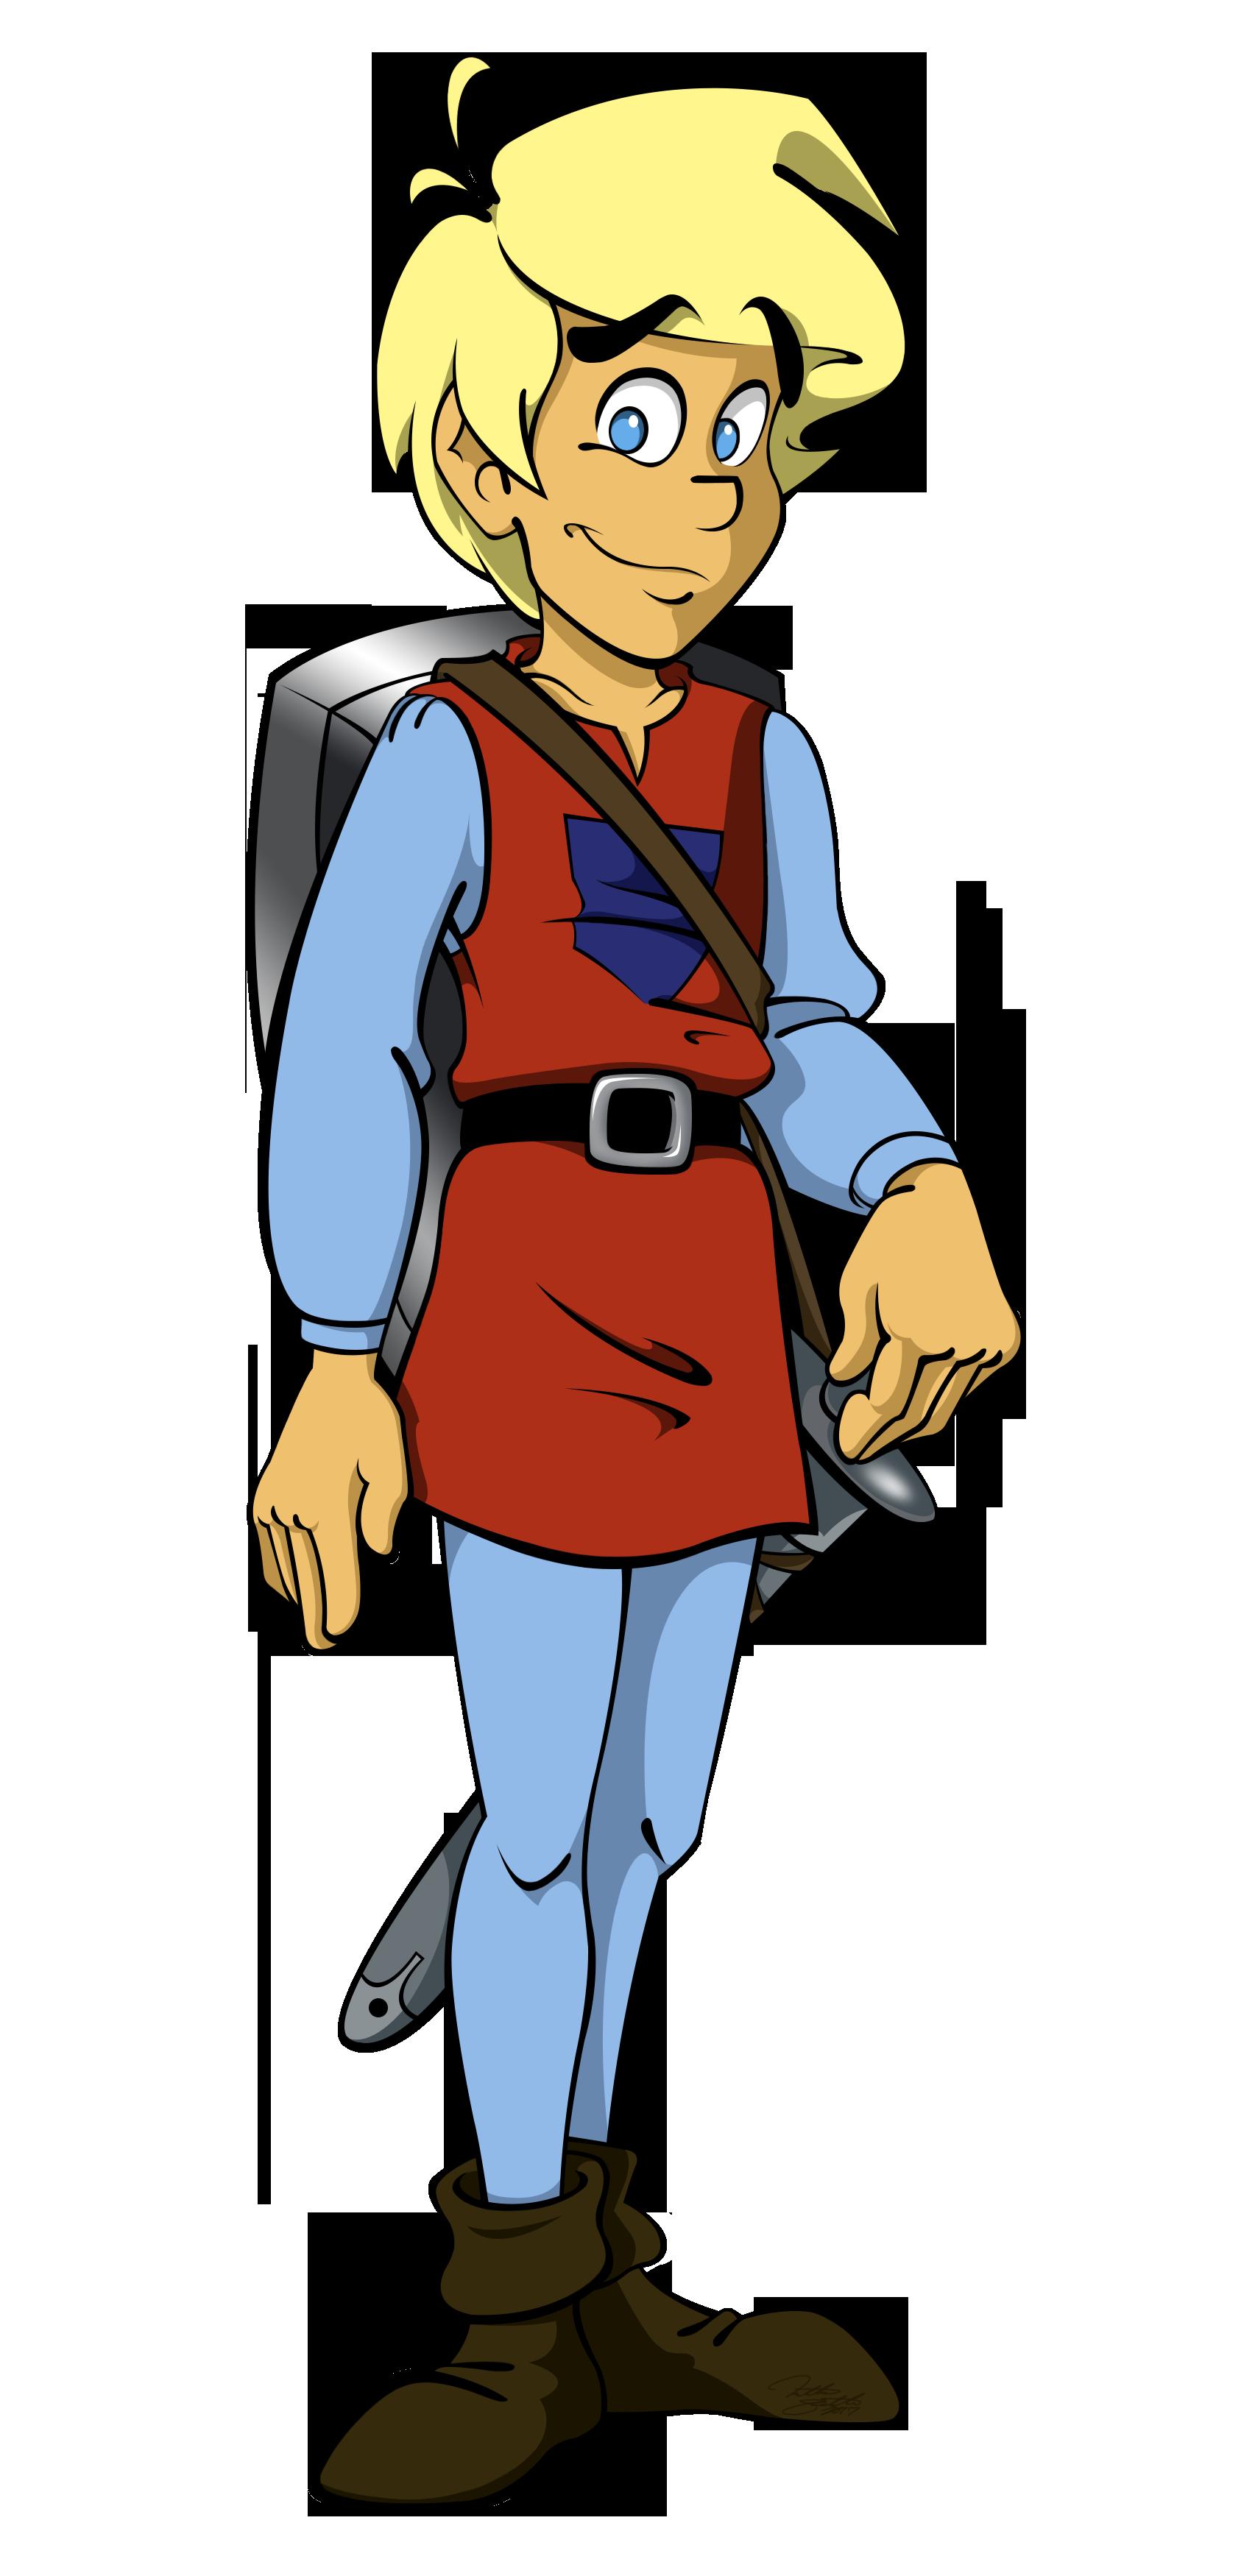 Knight clipart squire. Josten lancaster ld stories